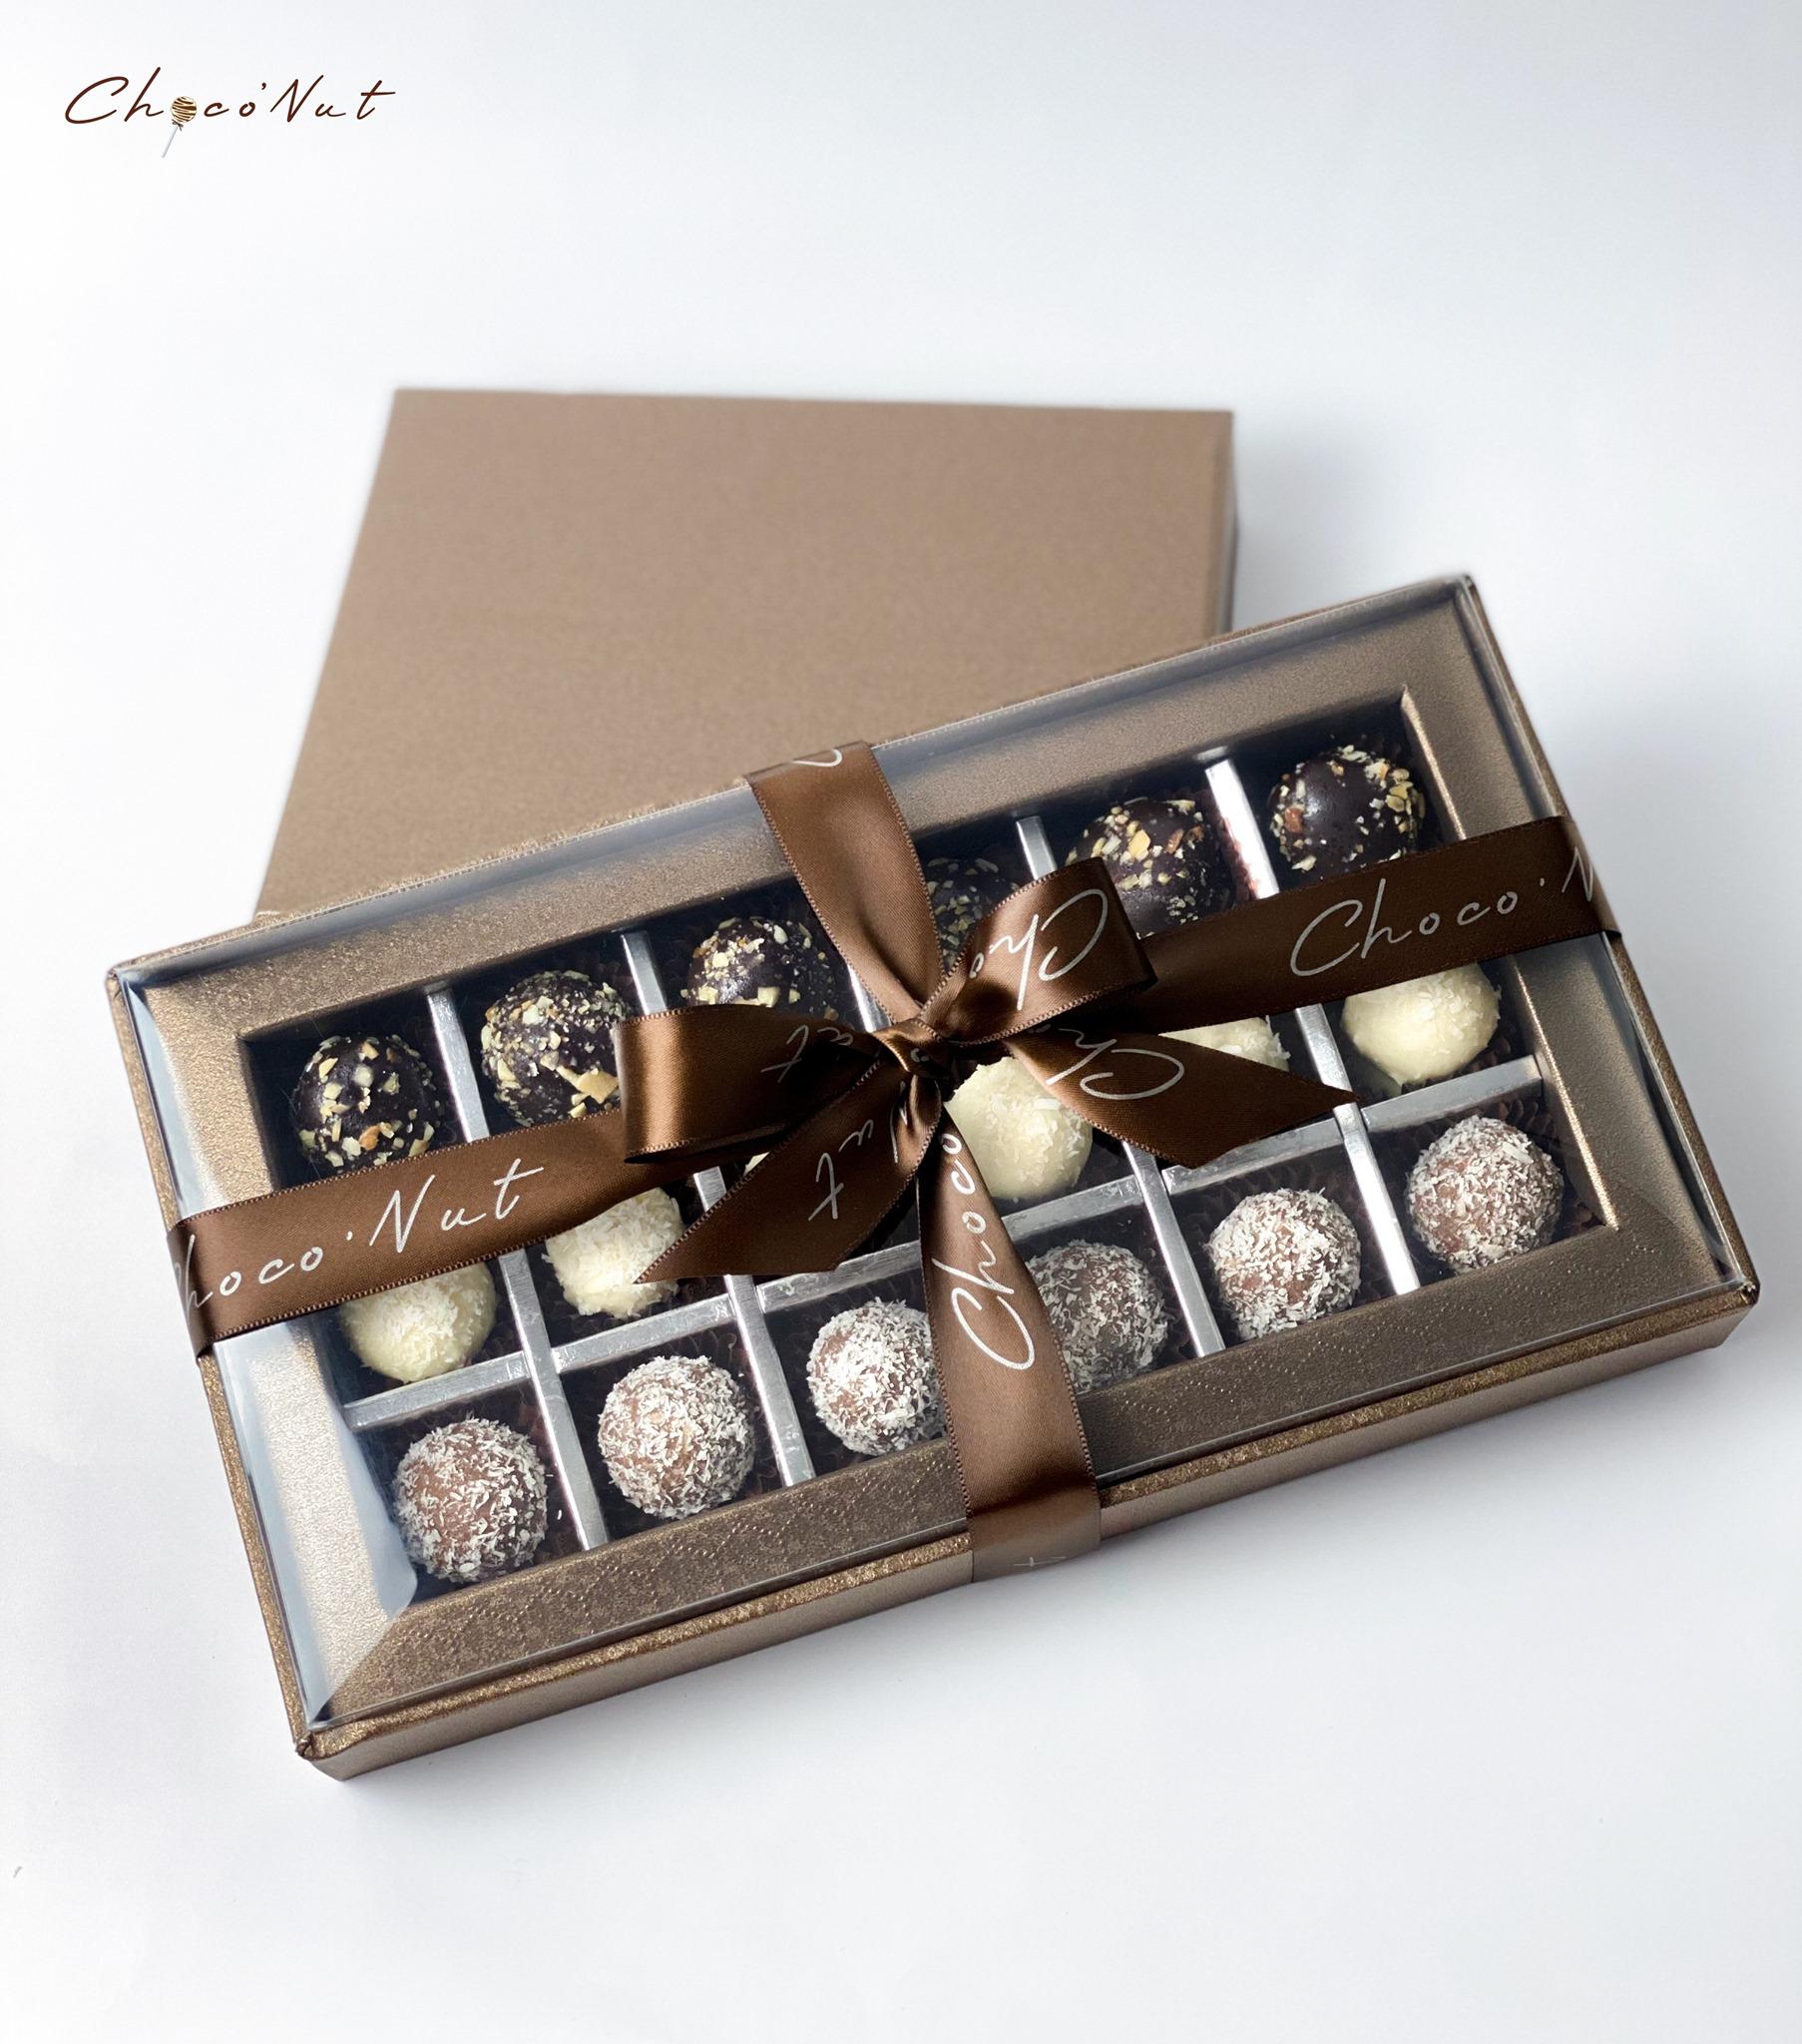 Choconut handmade